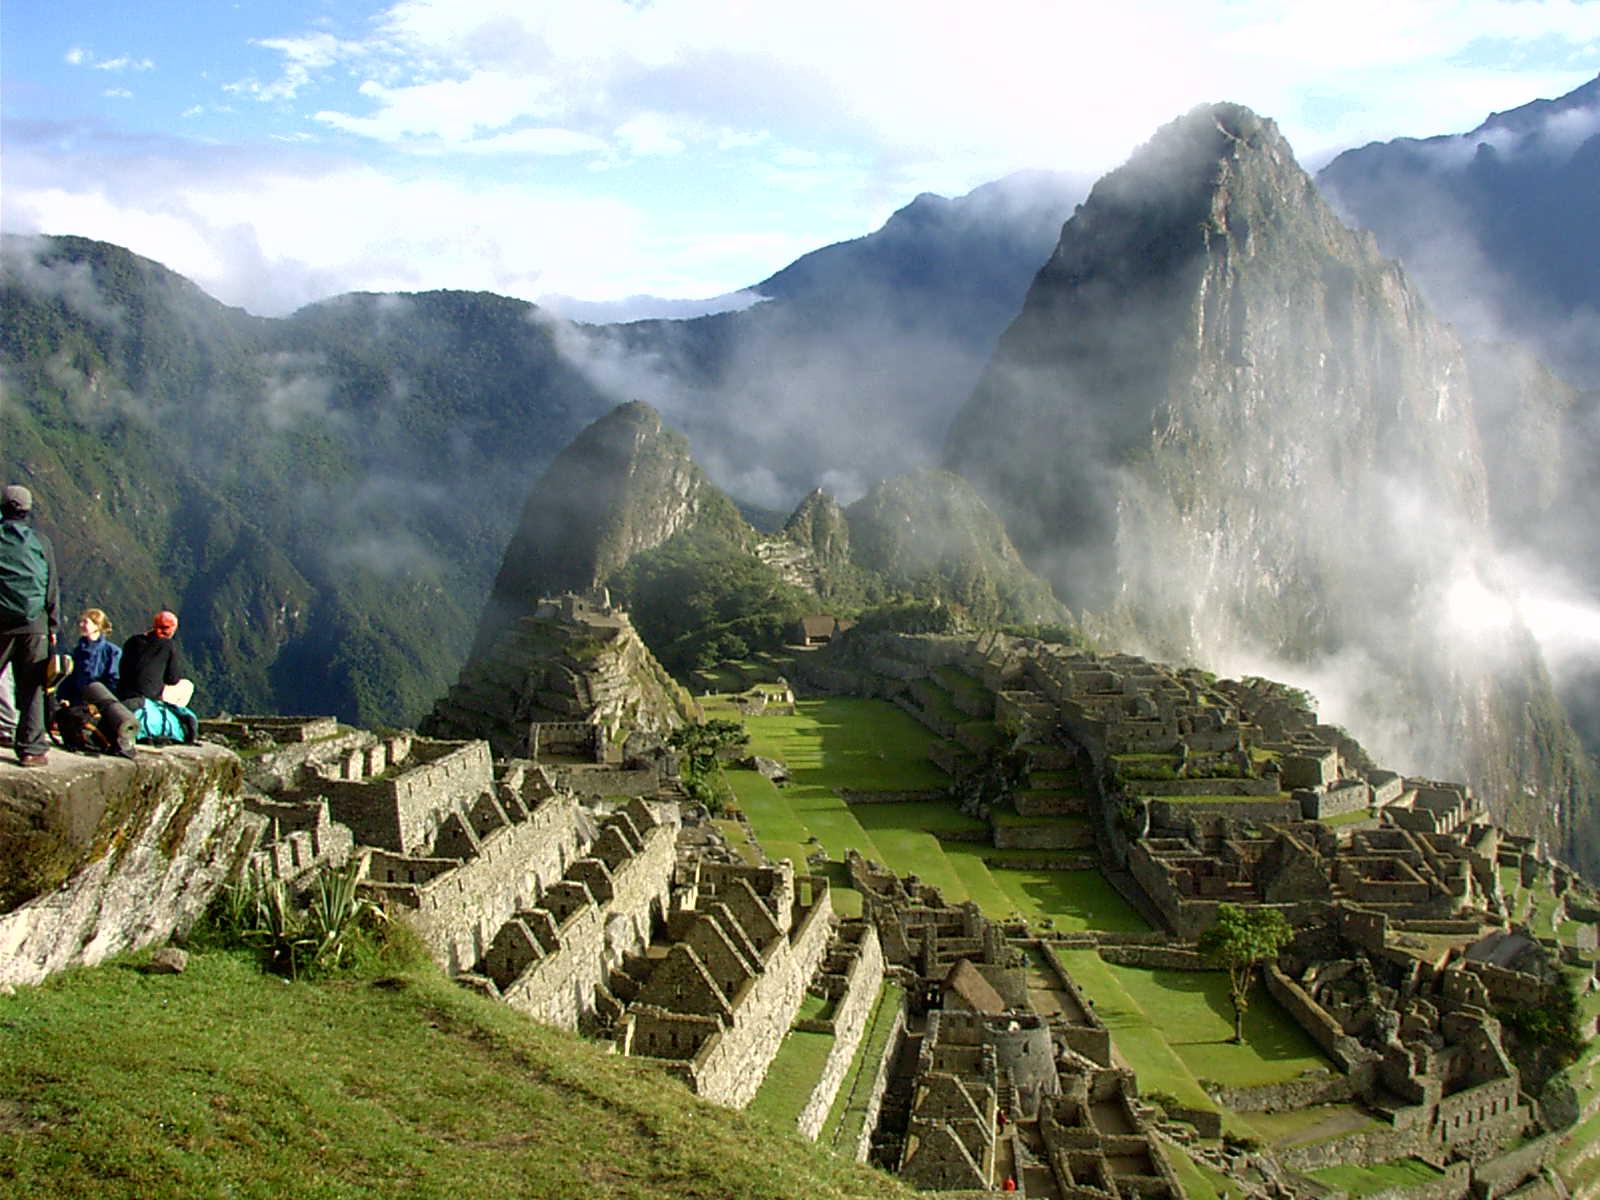 camino-inca-machu-picchu-tours-3